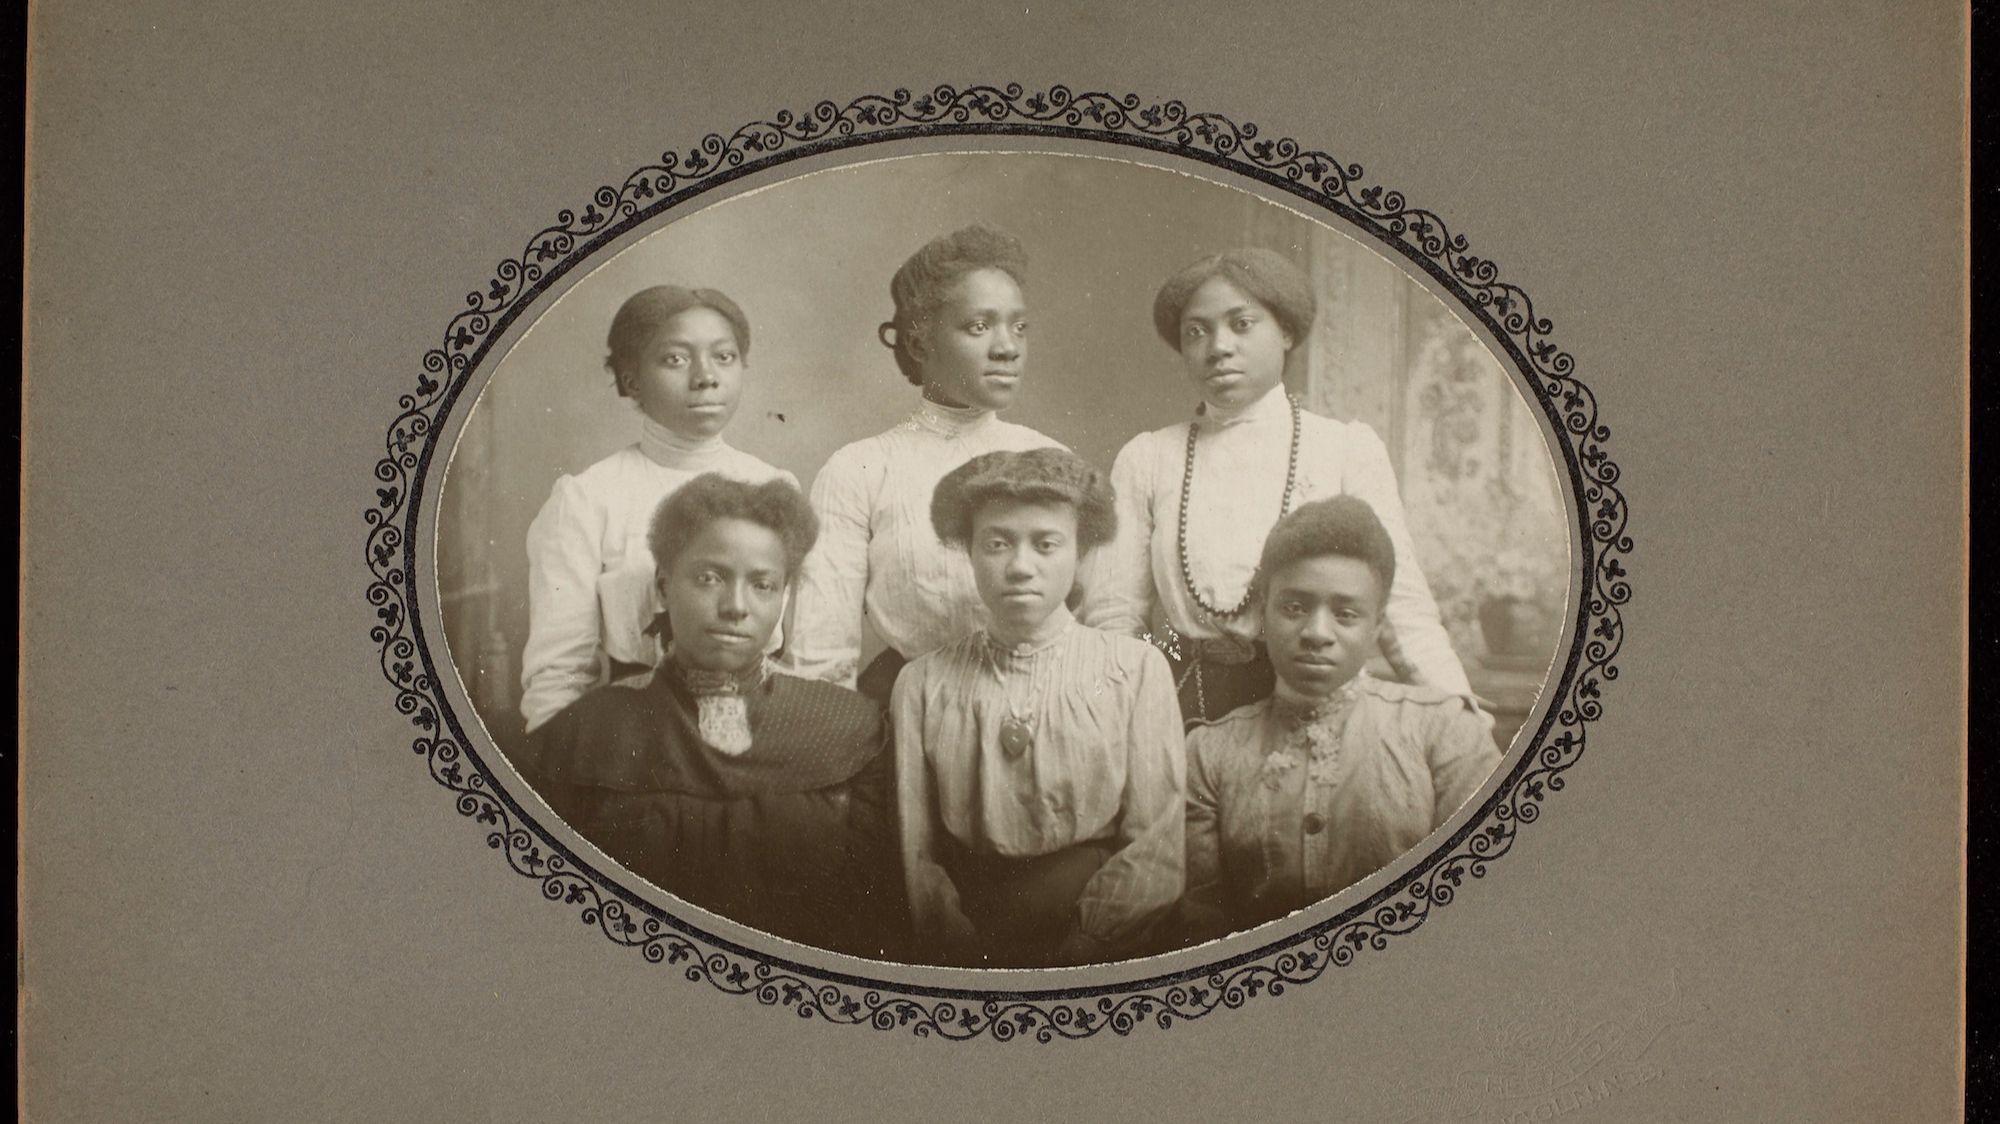 """Untitled (Portrait of Six Women)"" was shot by Hebard Studio in Lincoln, Neb., around 1910."